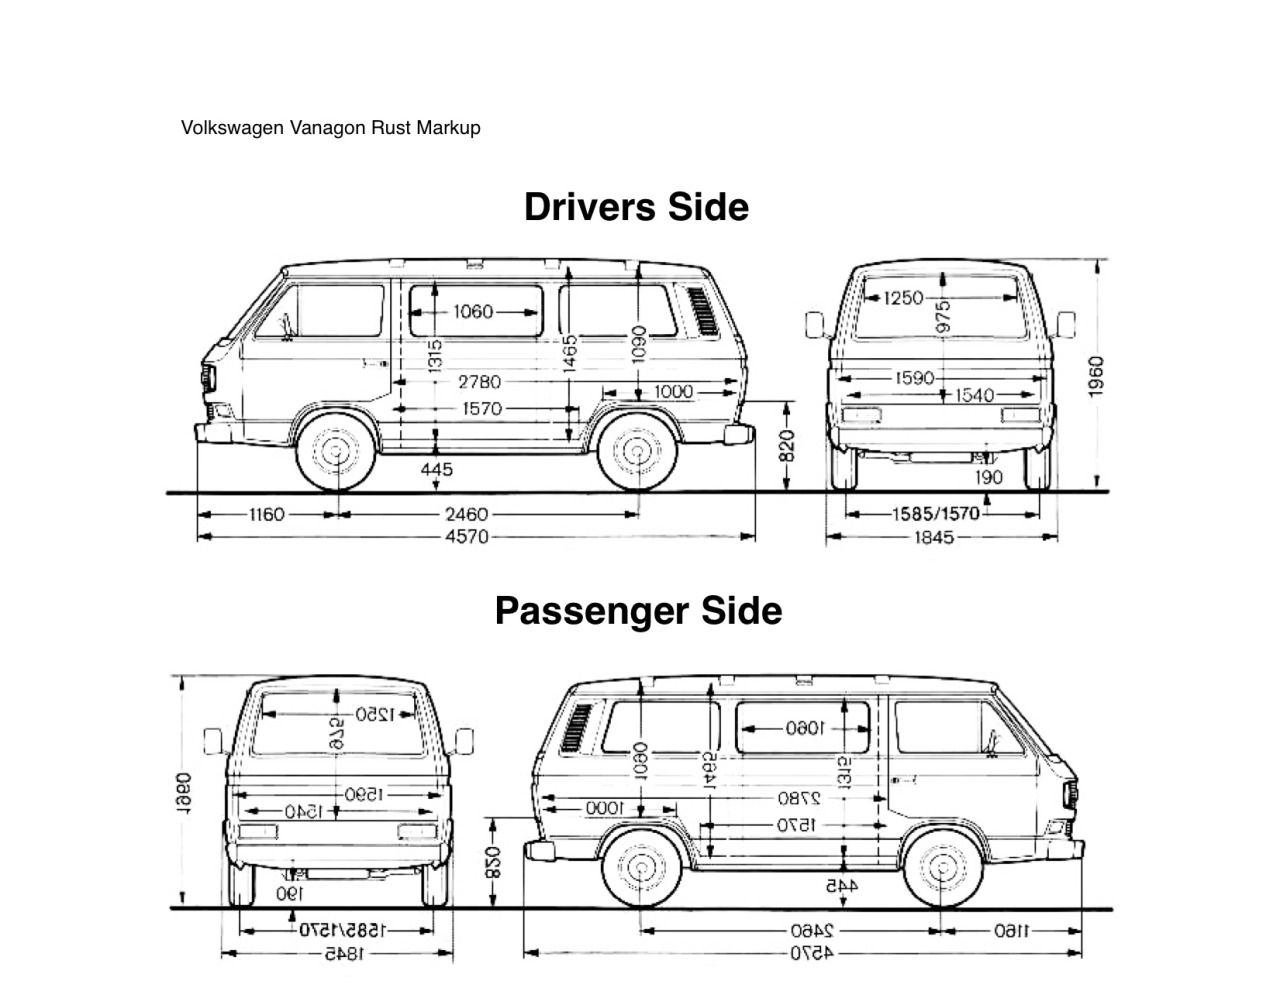 Vw Vanagon Rust Diagram